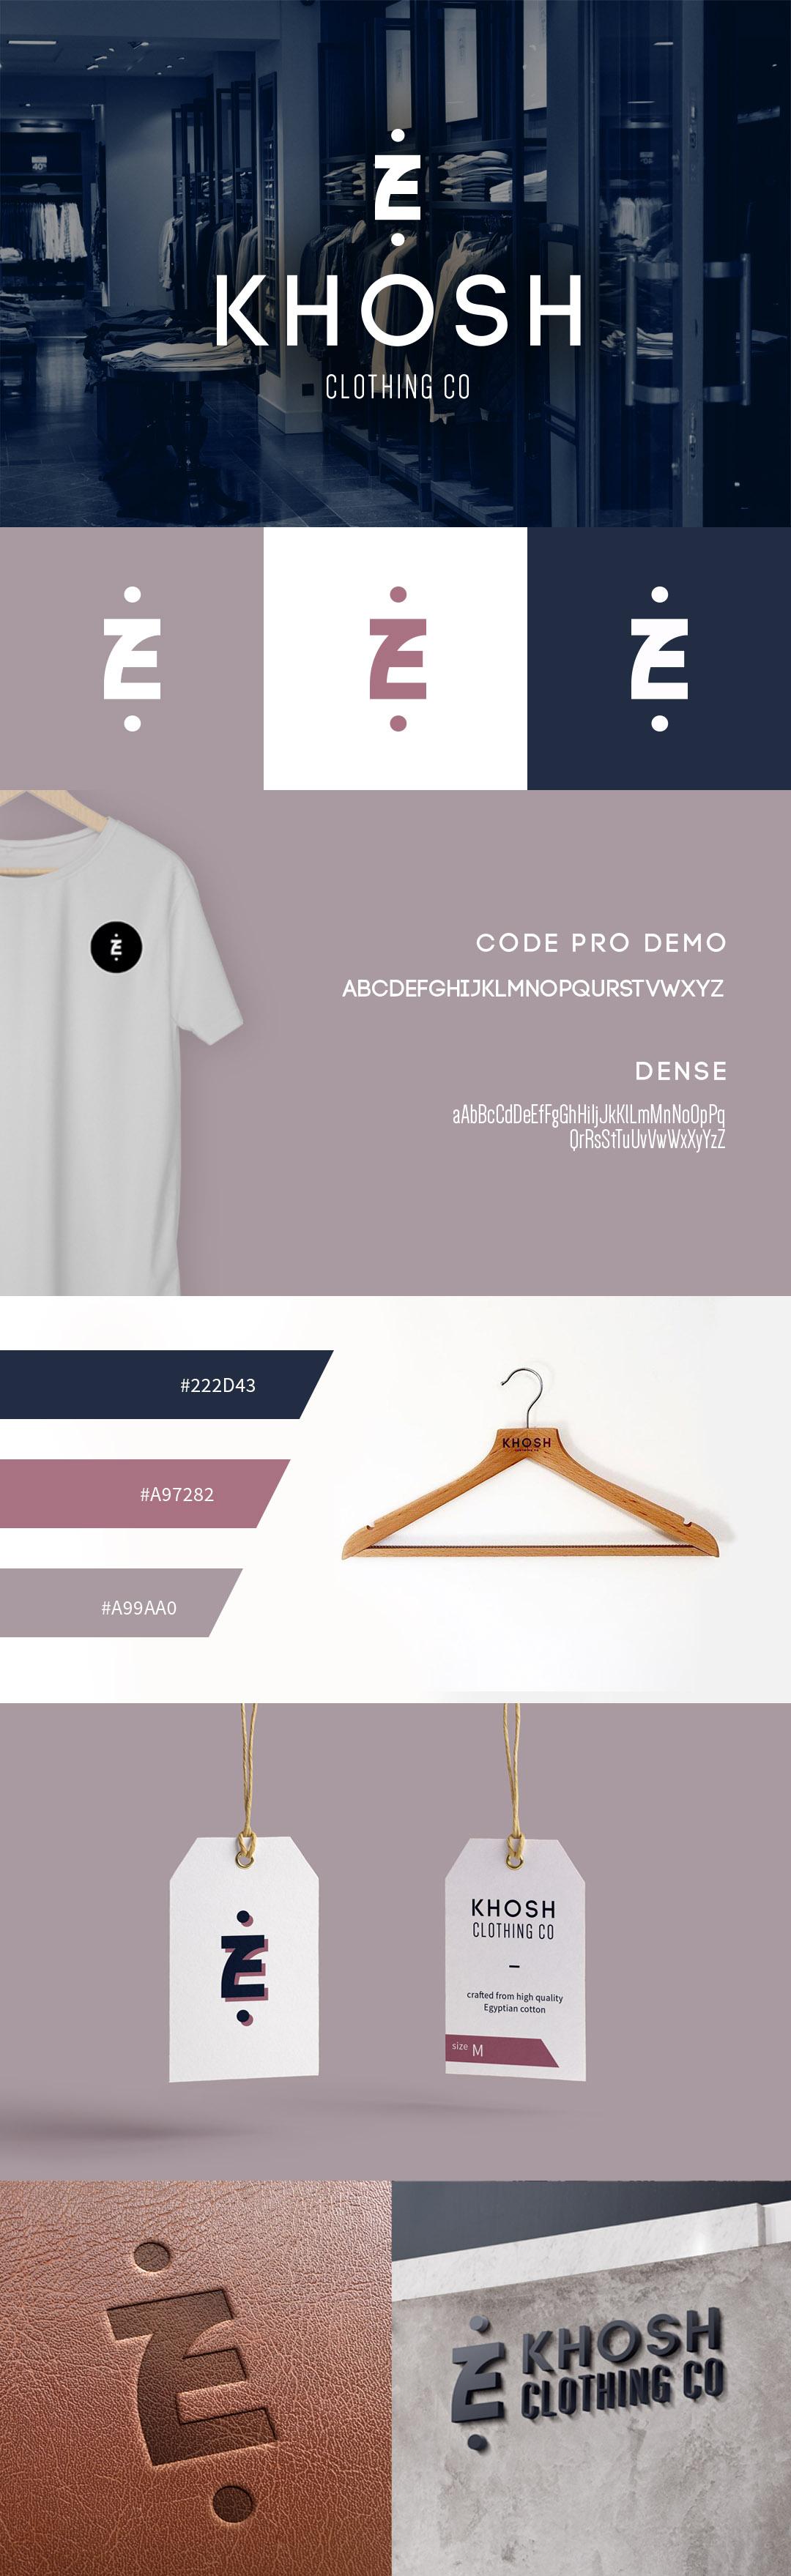 khosh Clothing stylescape